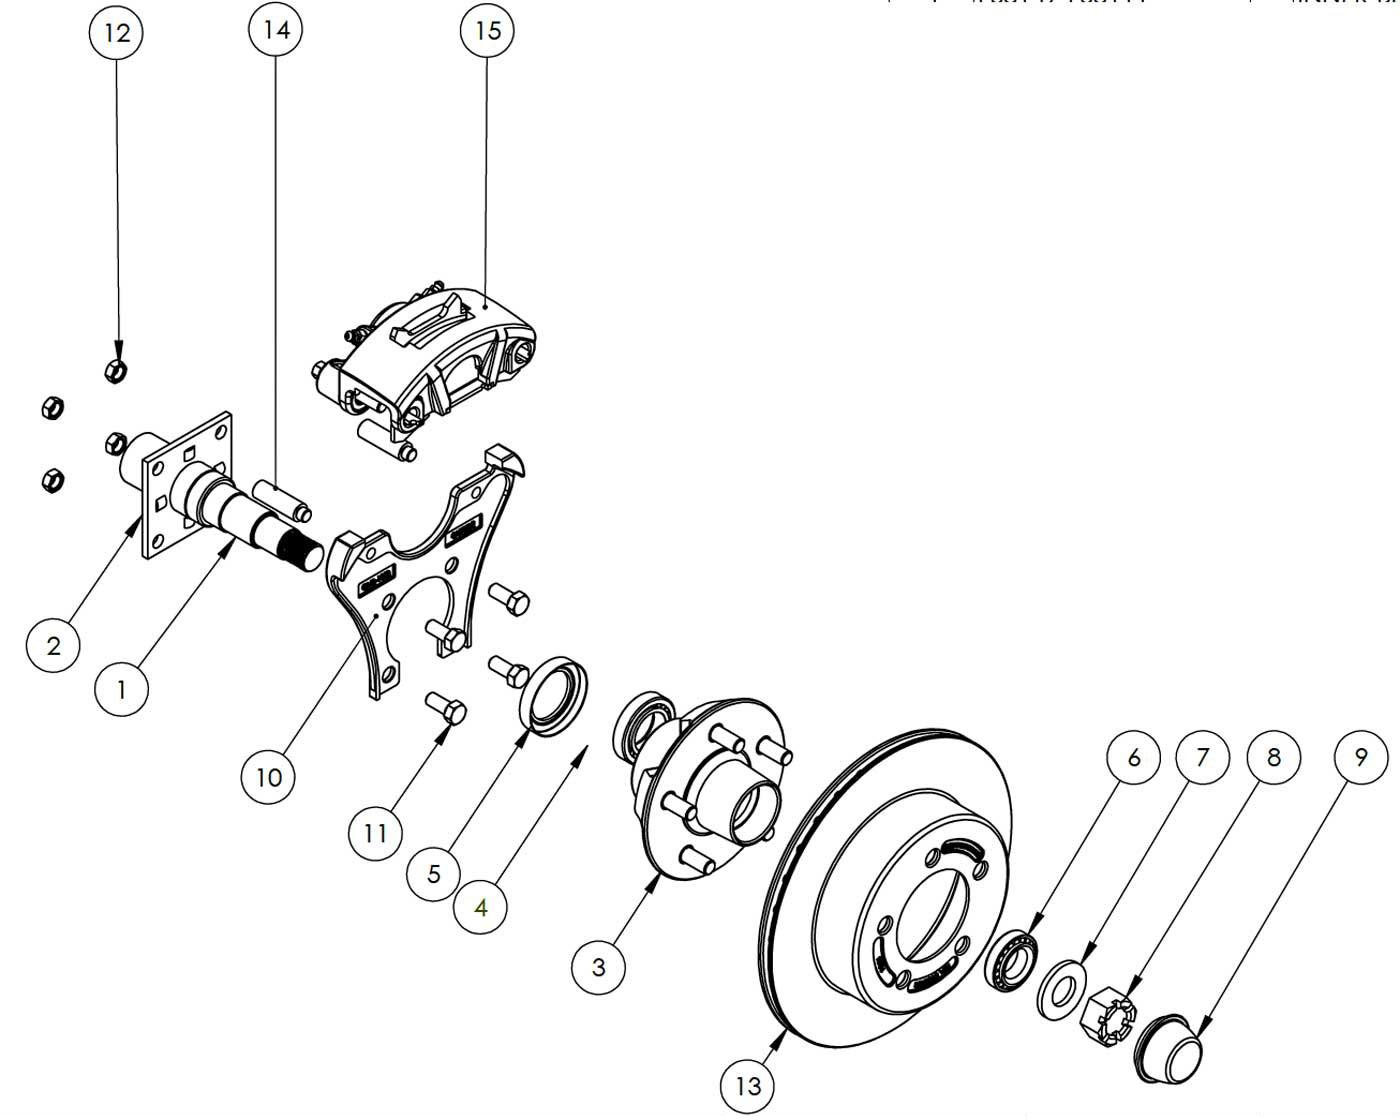 hight resolution of kodiak 3 5k 10 inch rotor surge disc brake parts illustration